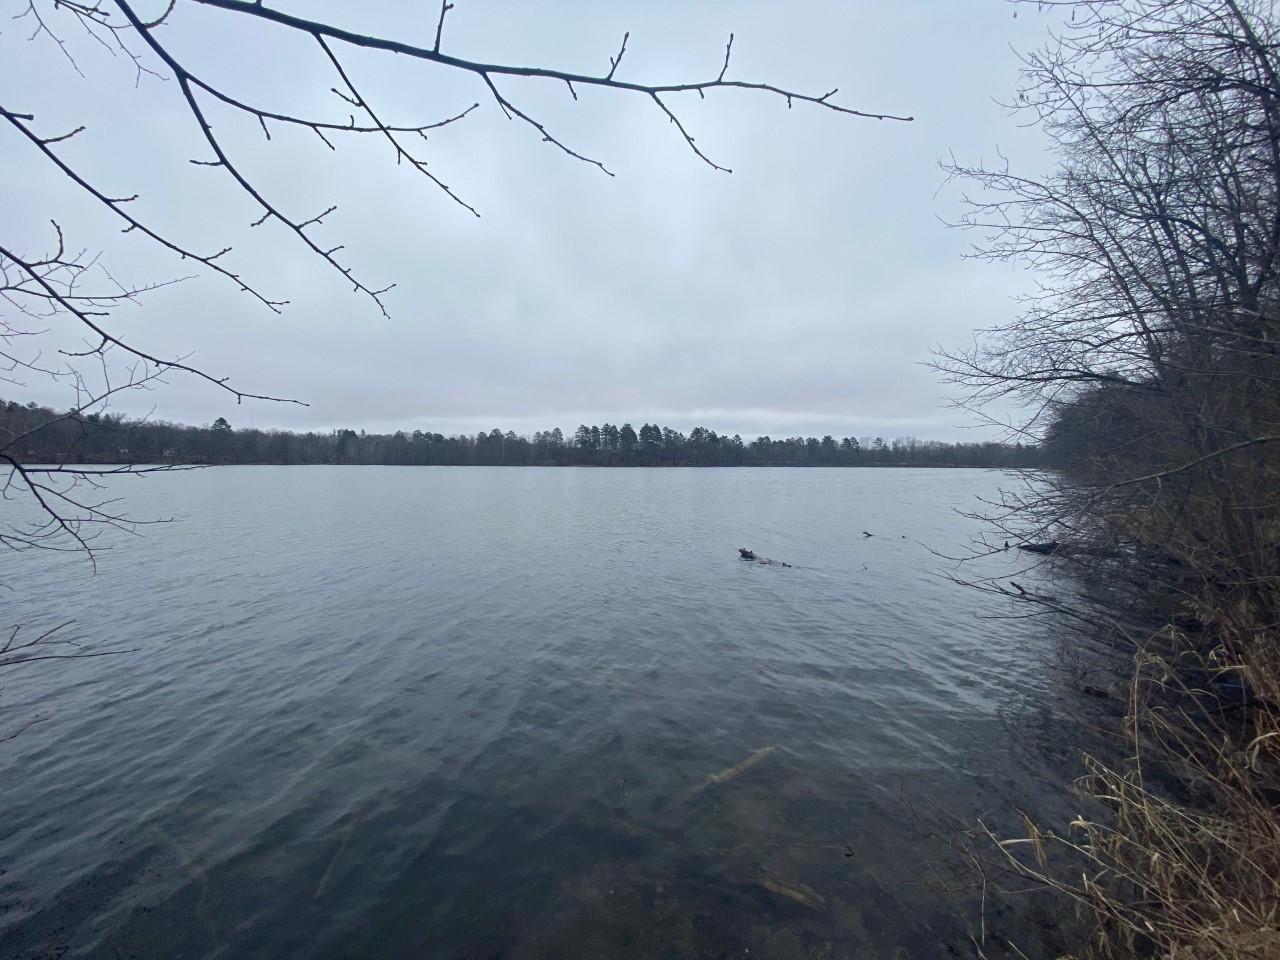 TBD6 Early Bird Drive, Park Rapids, MN 56470